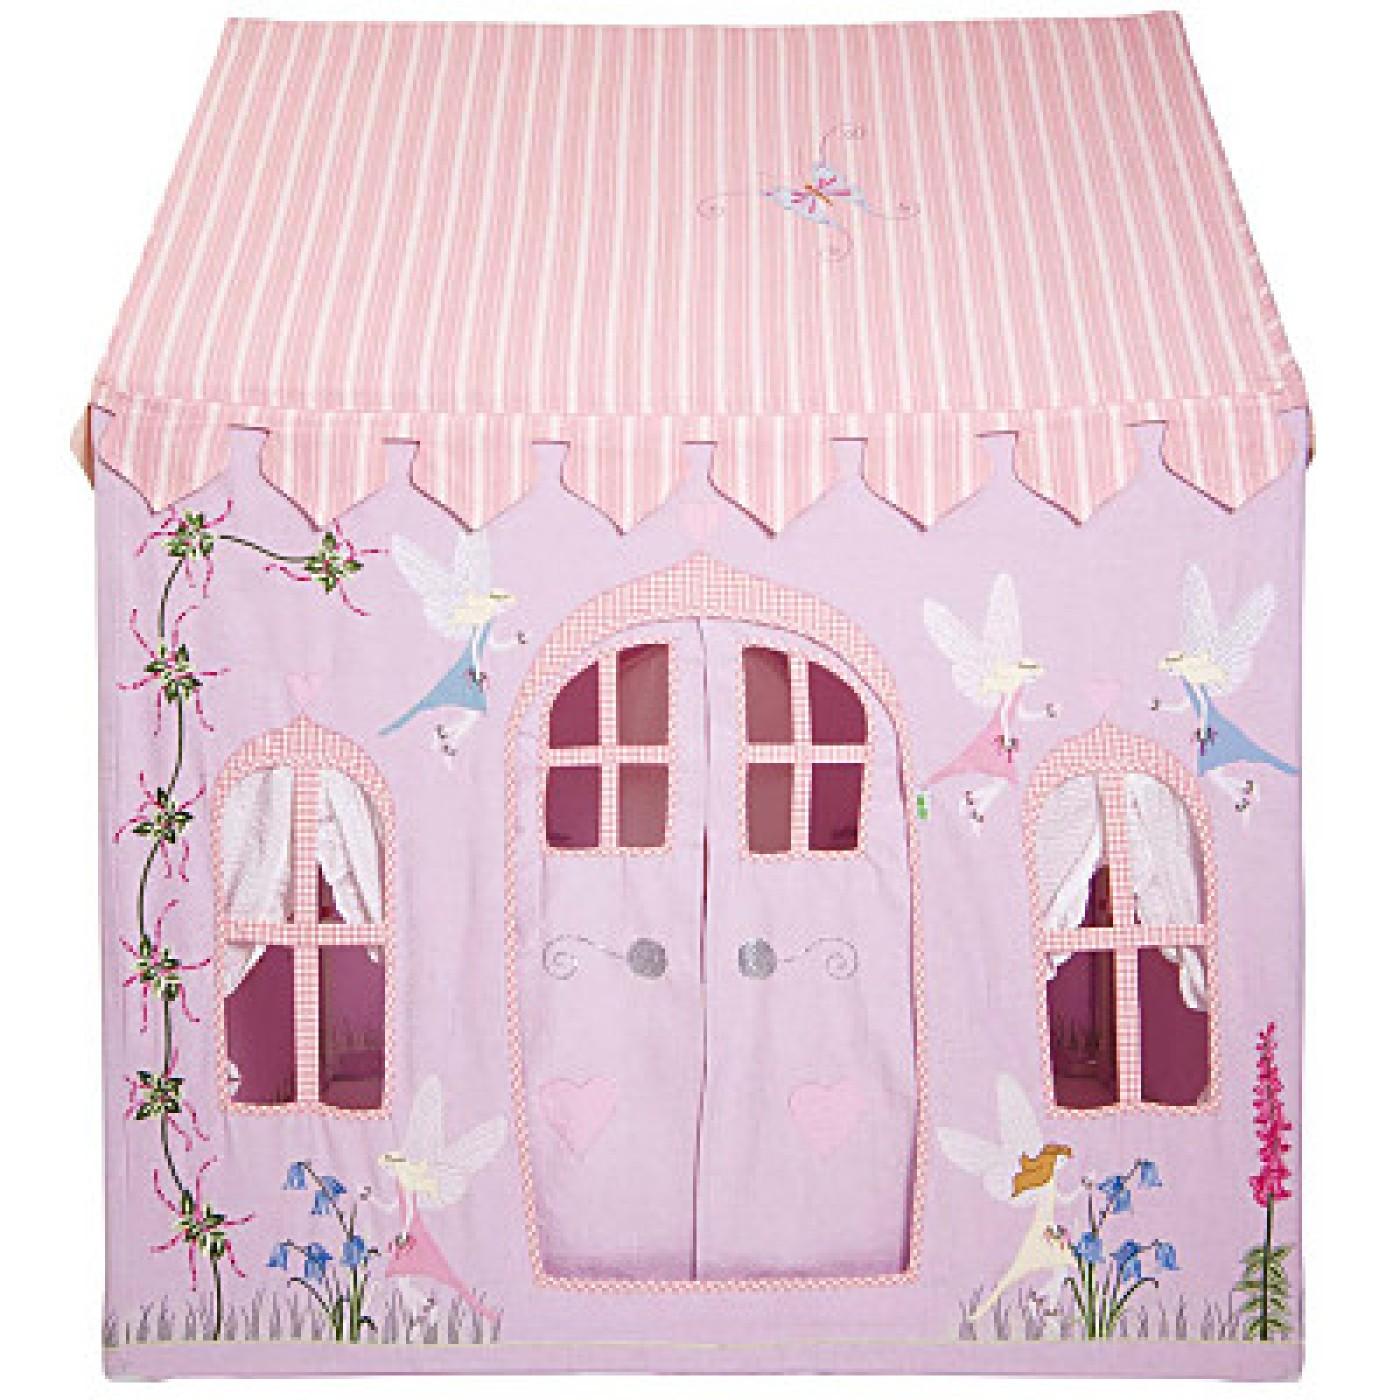 Fairy Cottage Playhouse - Large